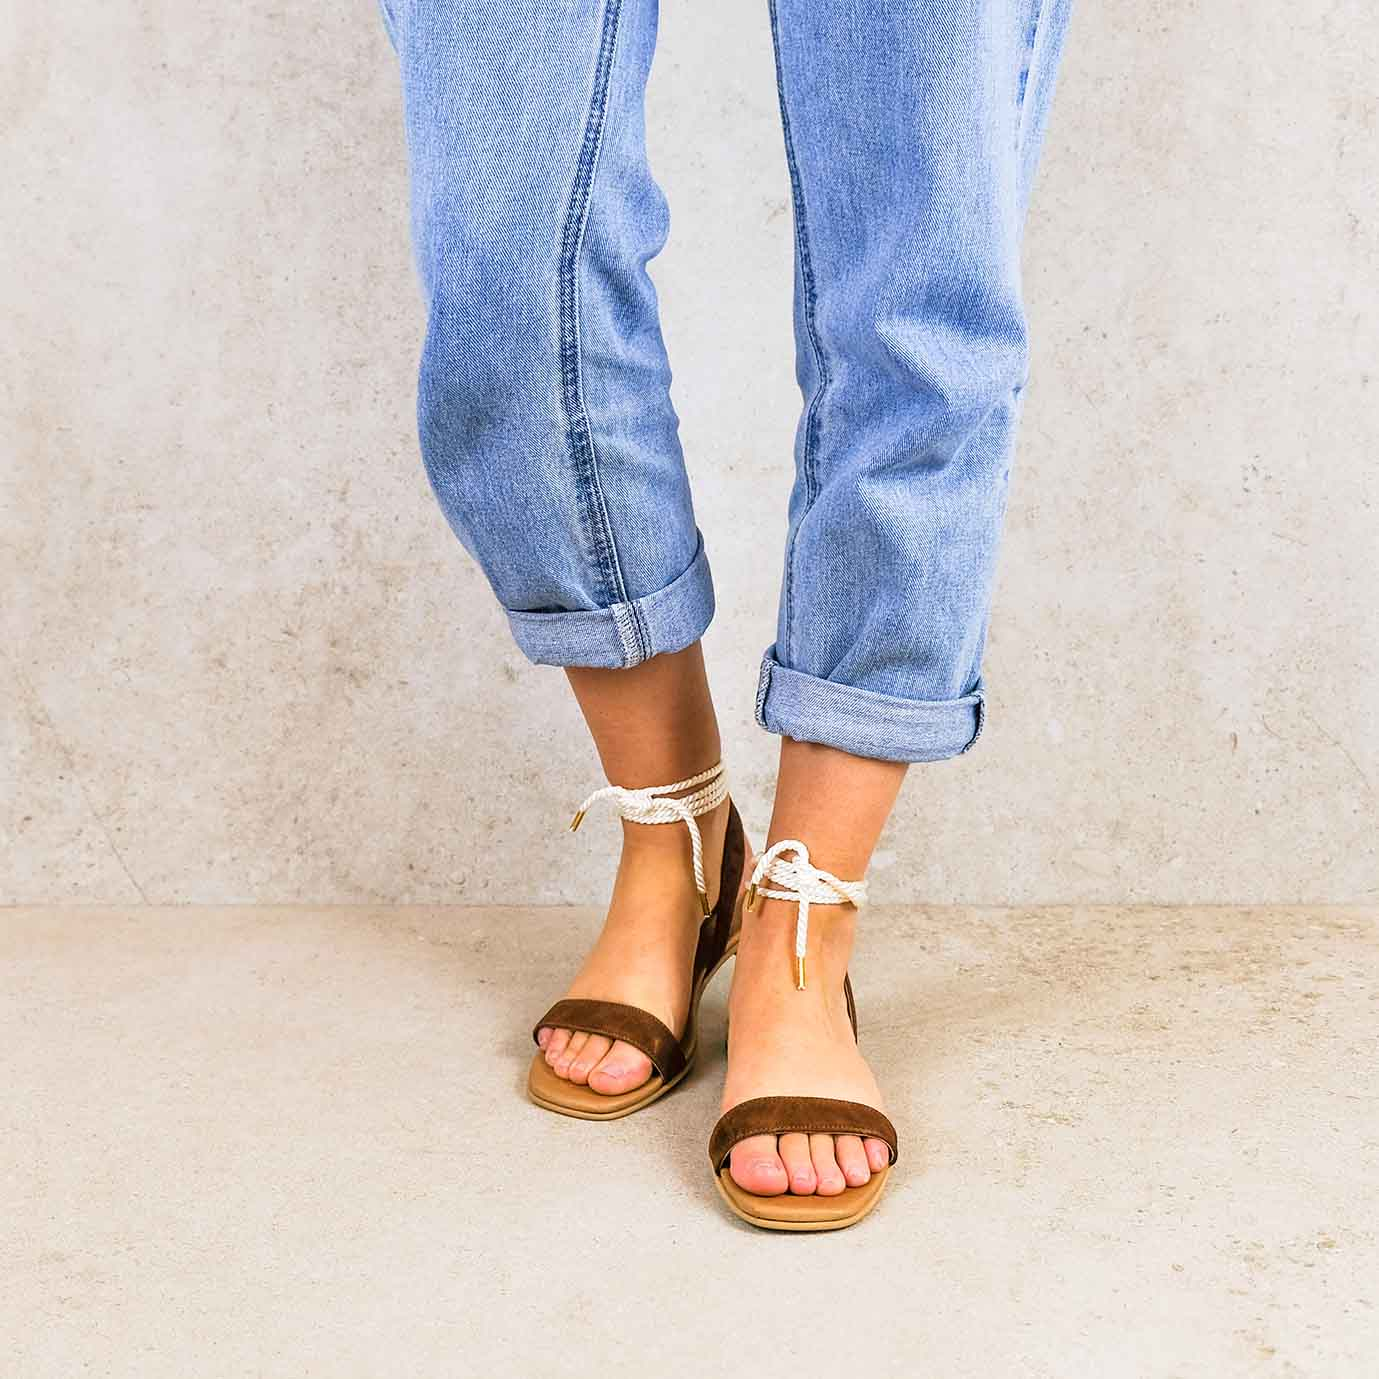 candela-brown_lintsandalen sandals travelsandals vegan sustainable sandals wikkelsandalen